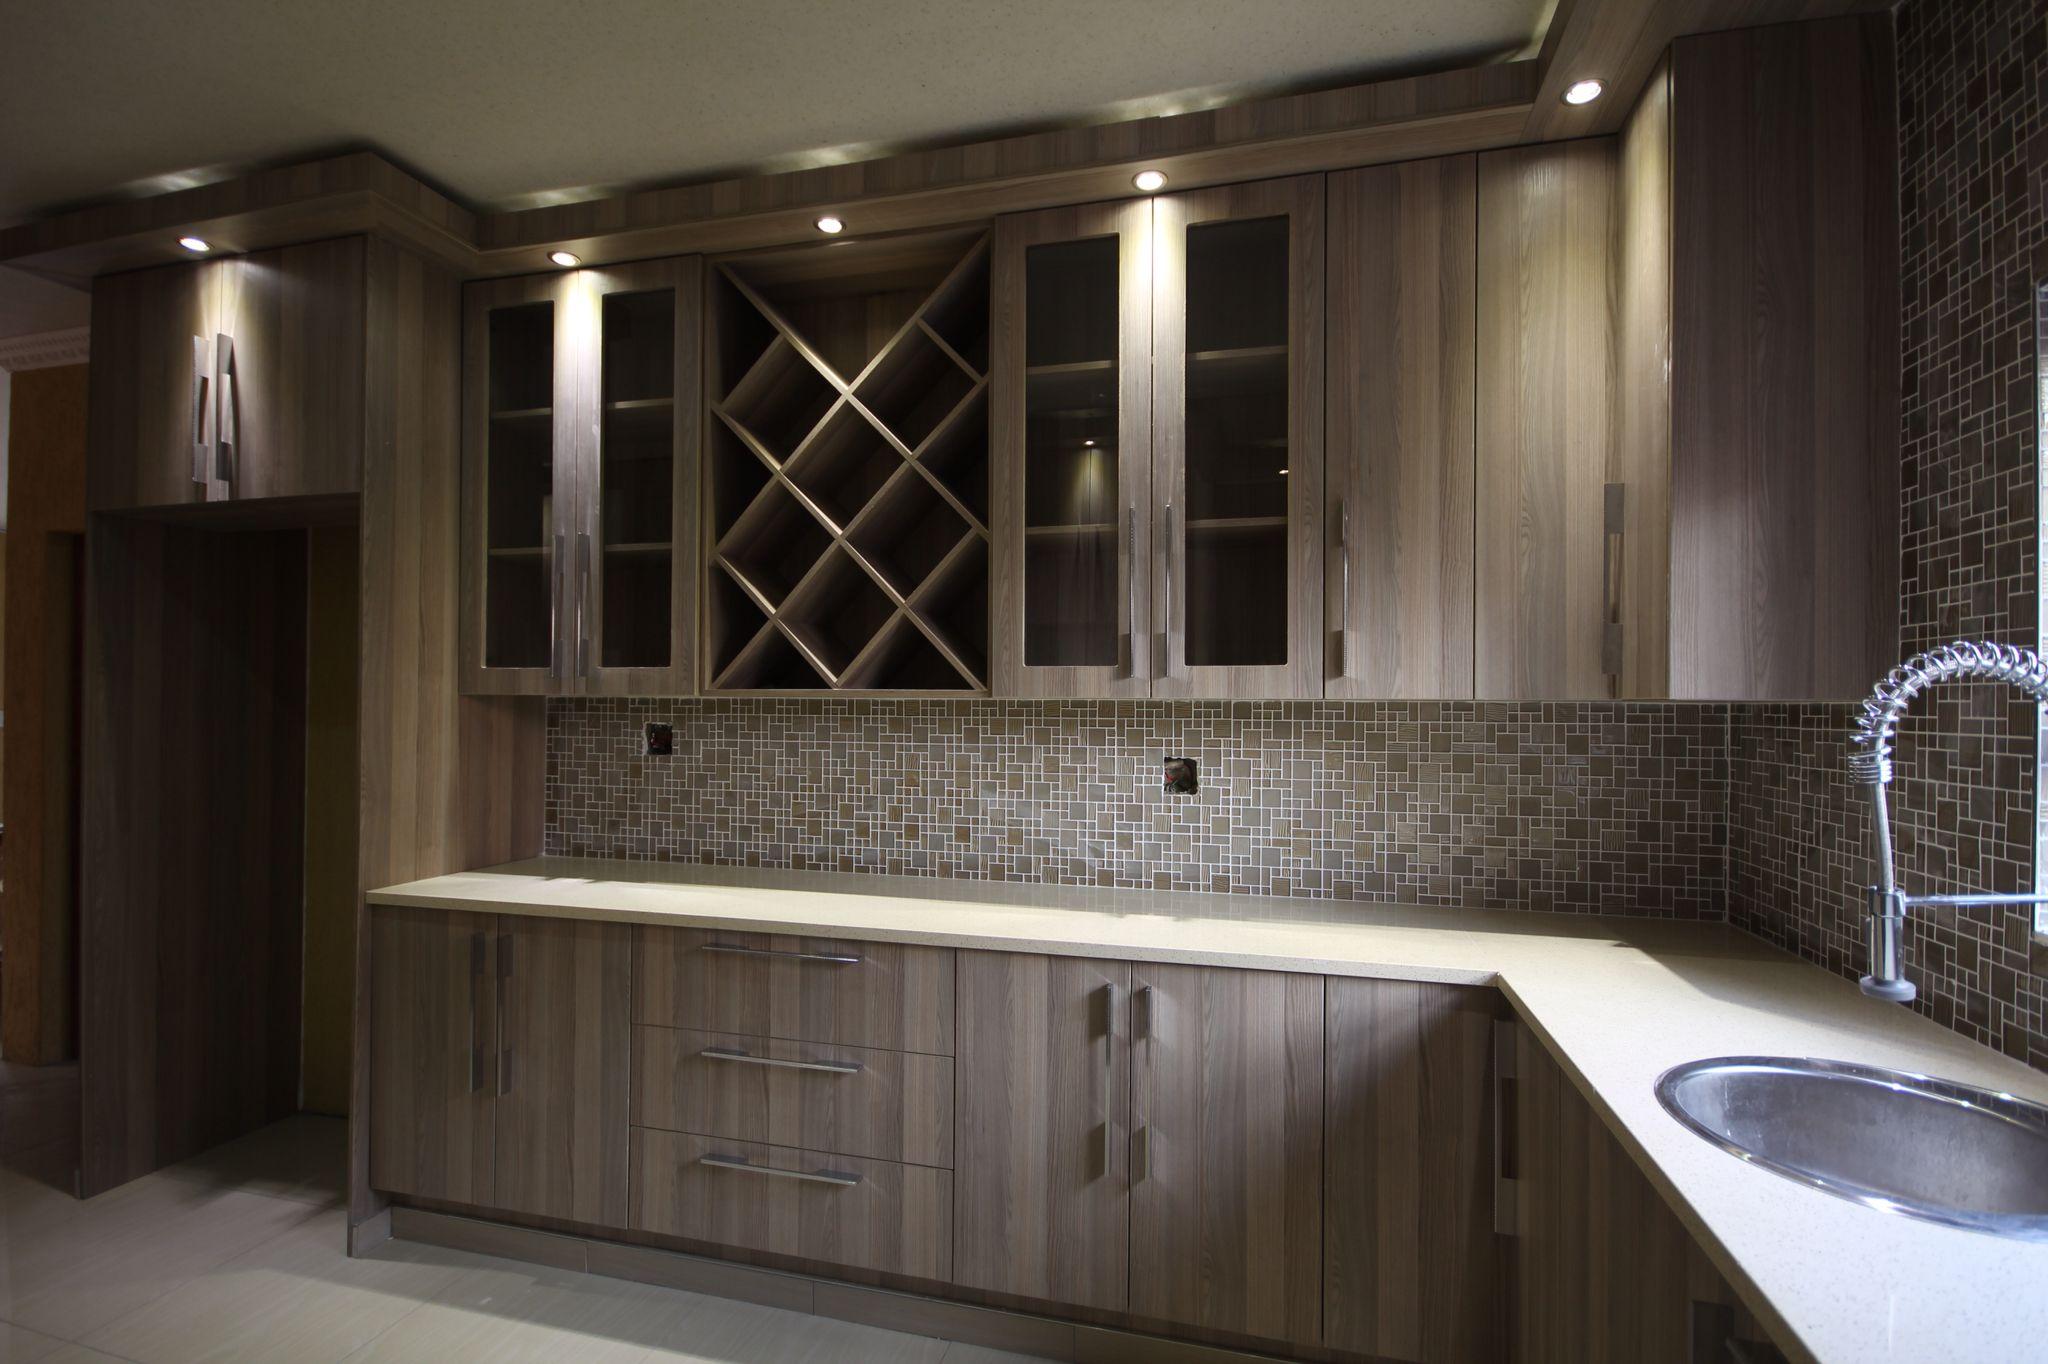 Coimbra melamine kitchen quality cupboard solutions for Melamine kitchen designs